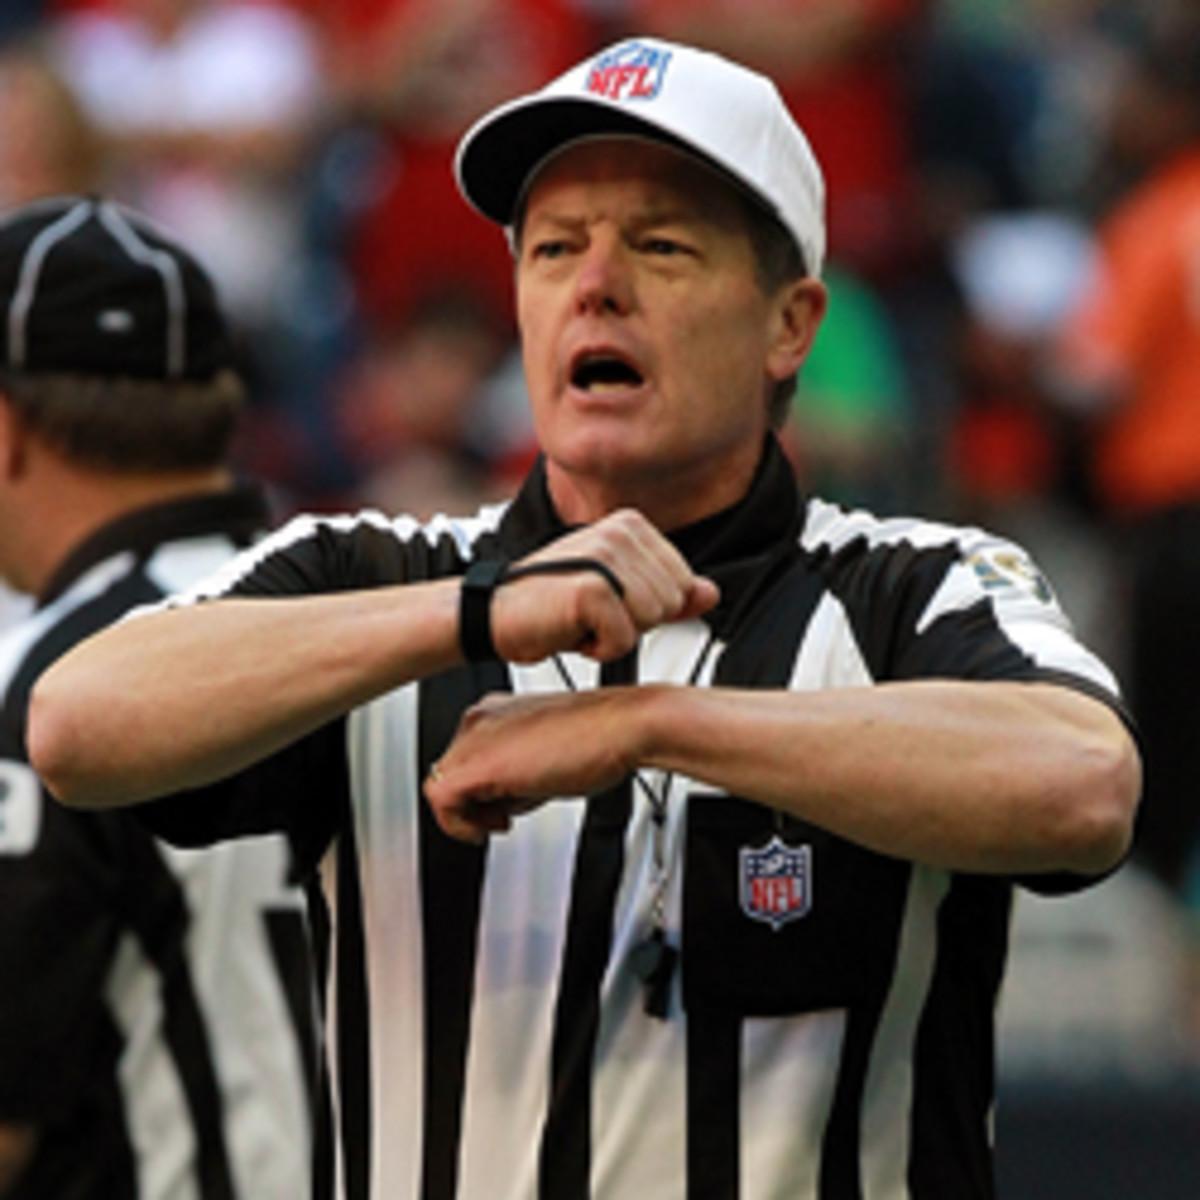 NFL-referee-illegal-procedure-Getty